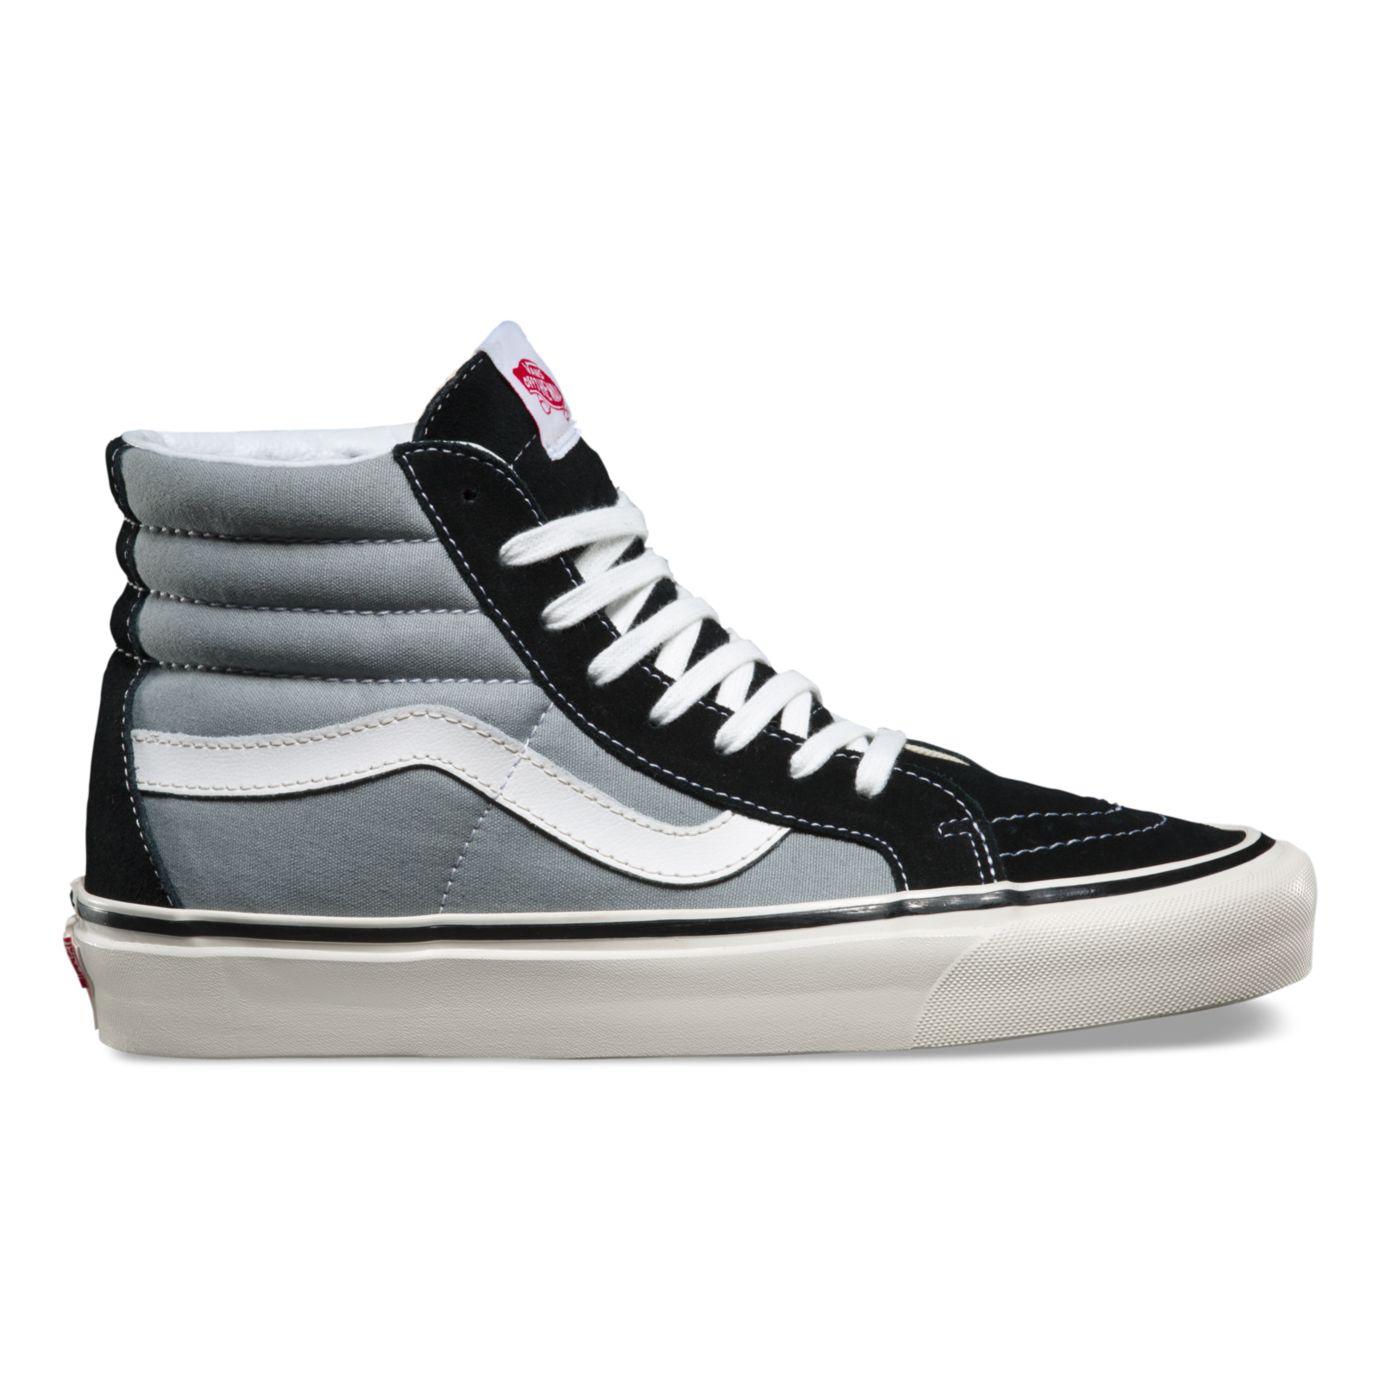 d7f748671a7b25 Vans Releases Footwear Pack Inspired by Original Anaheim Factory